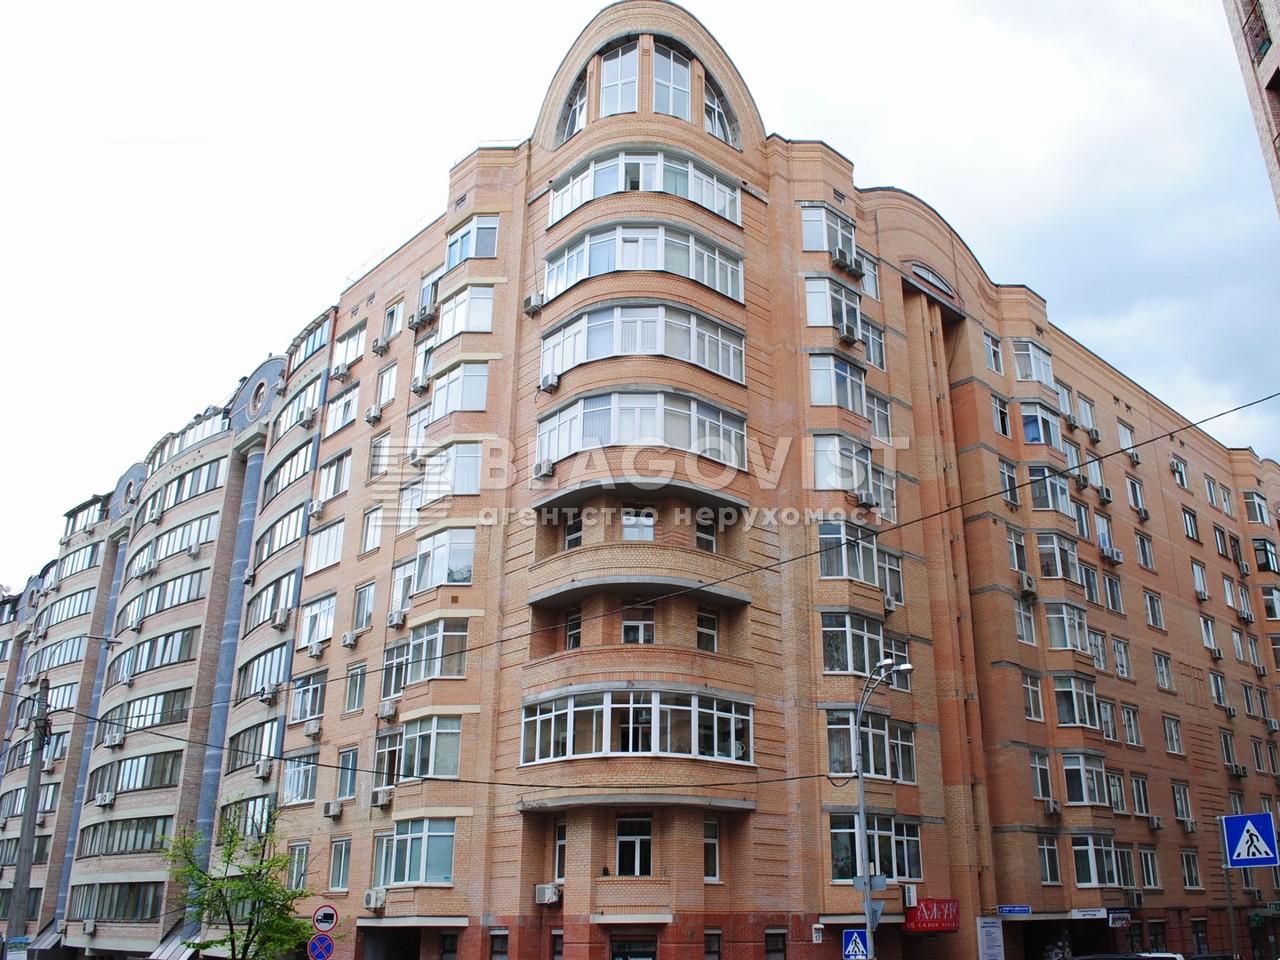 Квартира D-25395, Павловская, 17, Киев - Фото 1